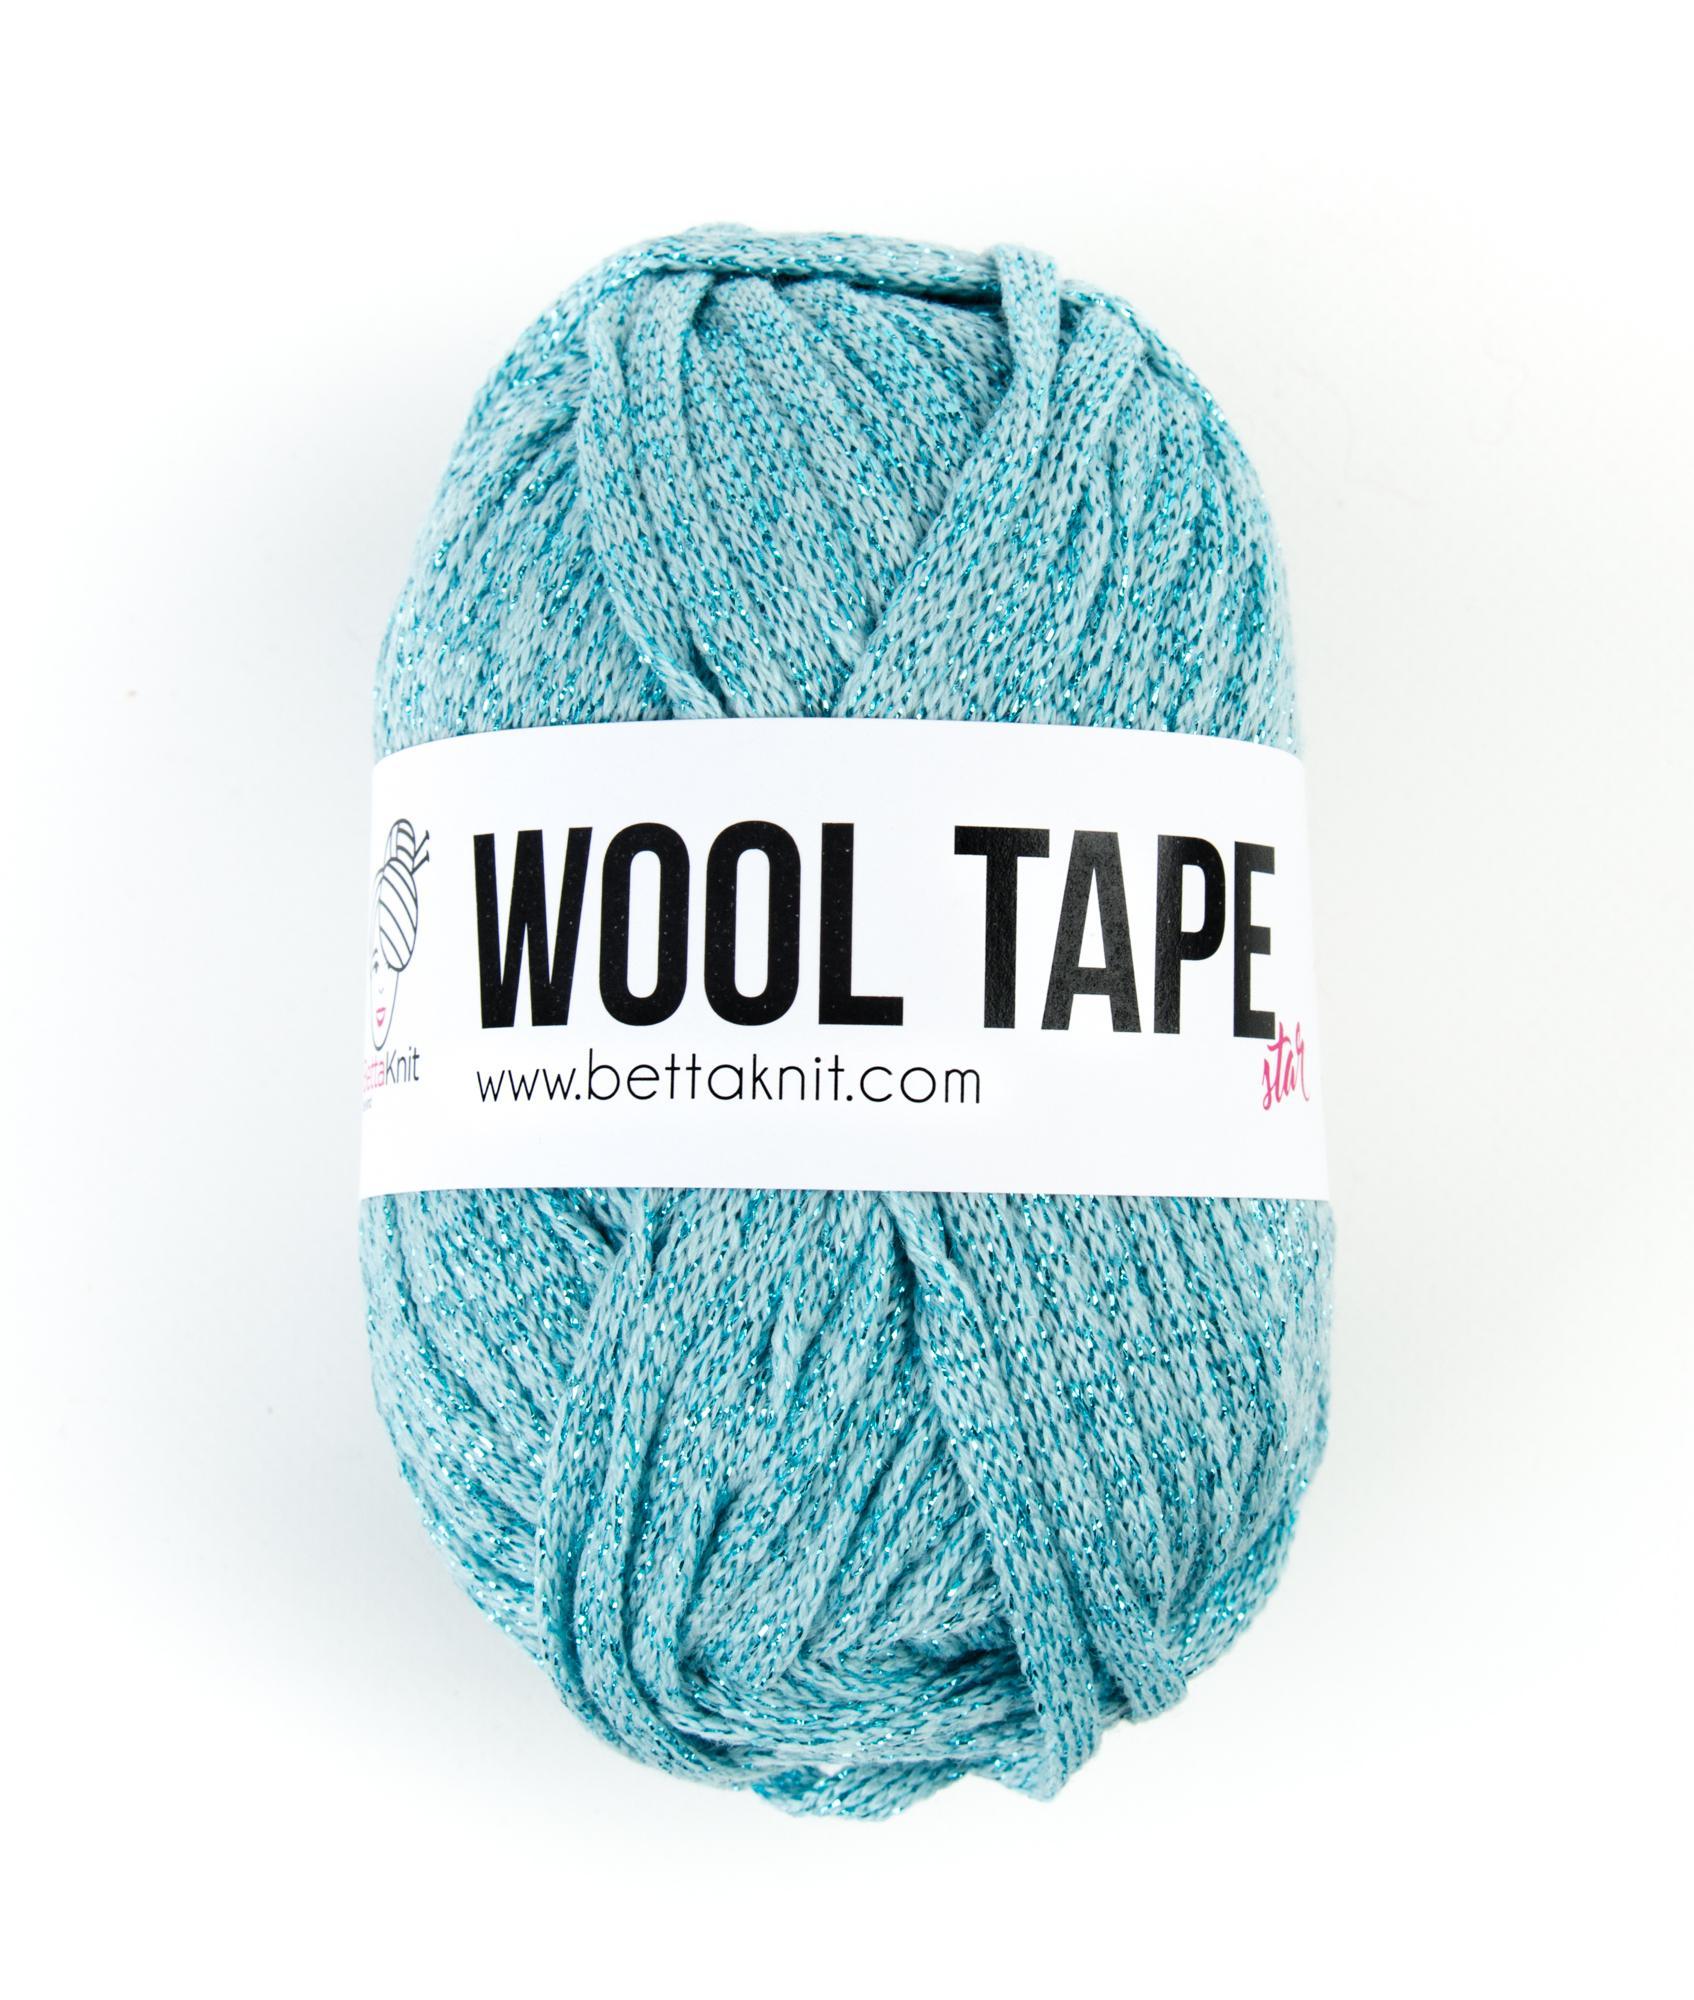 Saldi - Lurex - Wool Tape Star - Sfumature Blu - 1